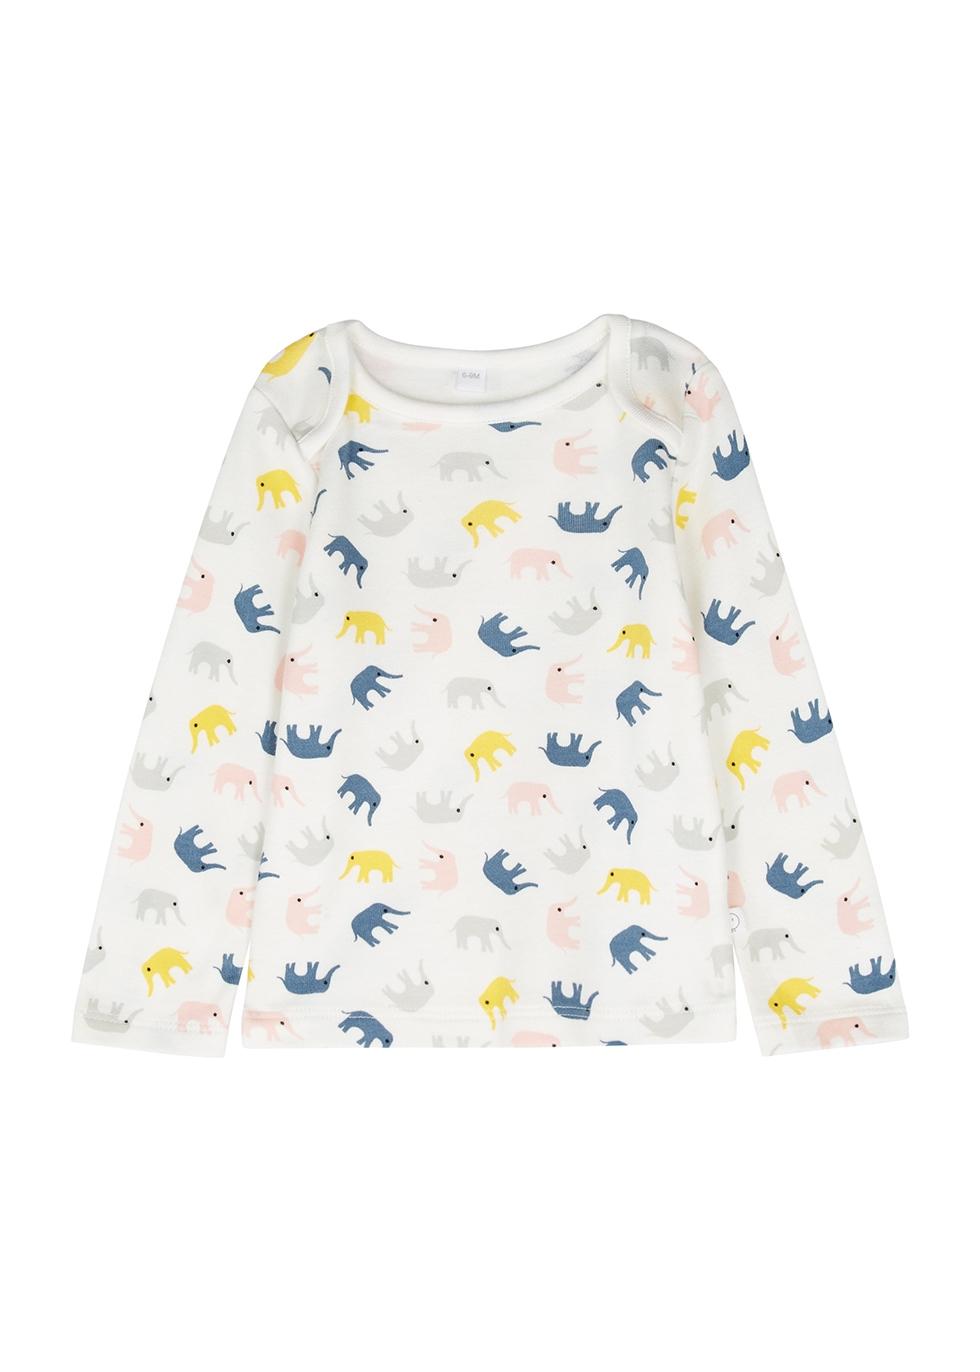 Elephant-print jersey top